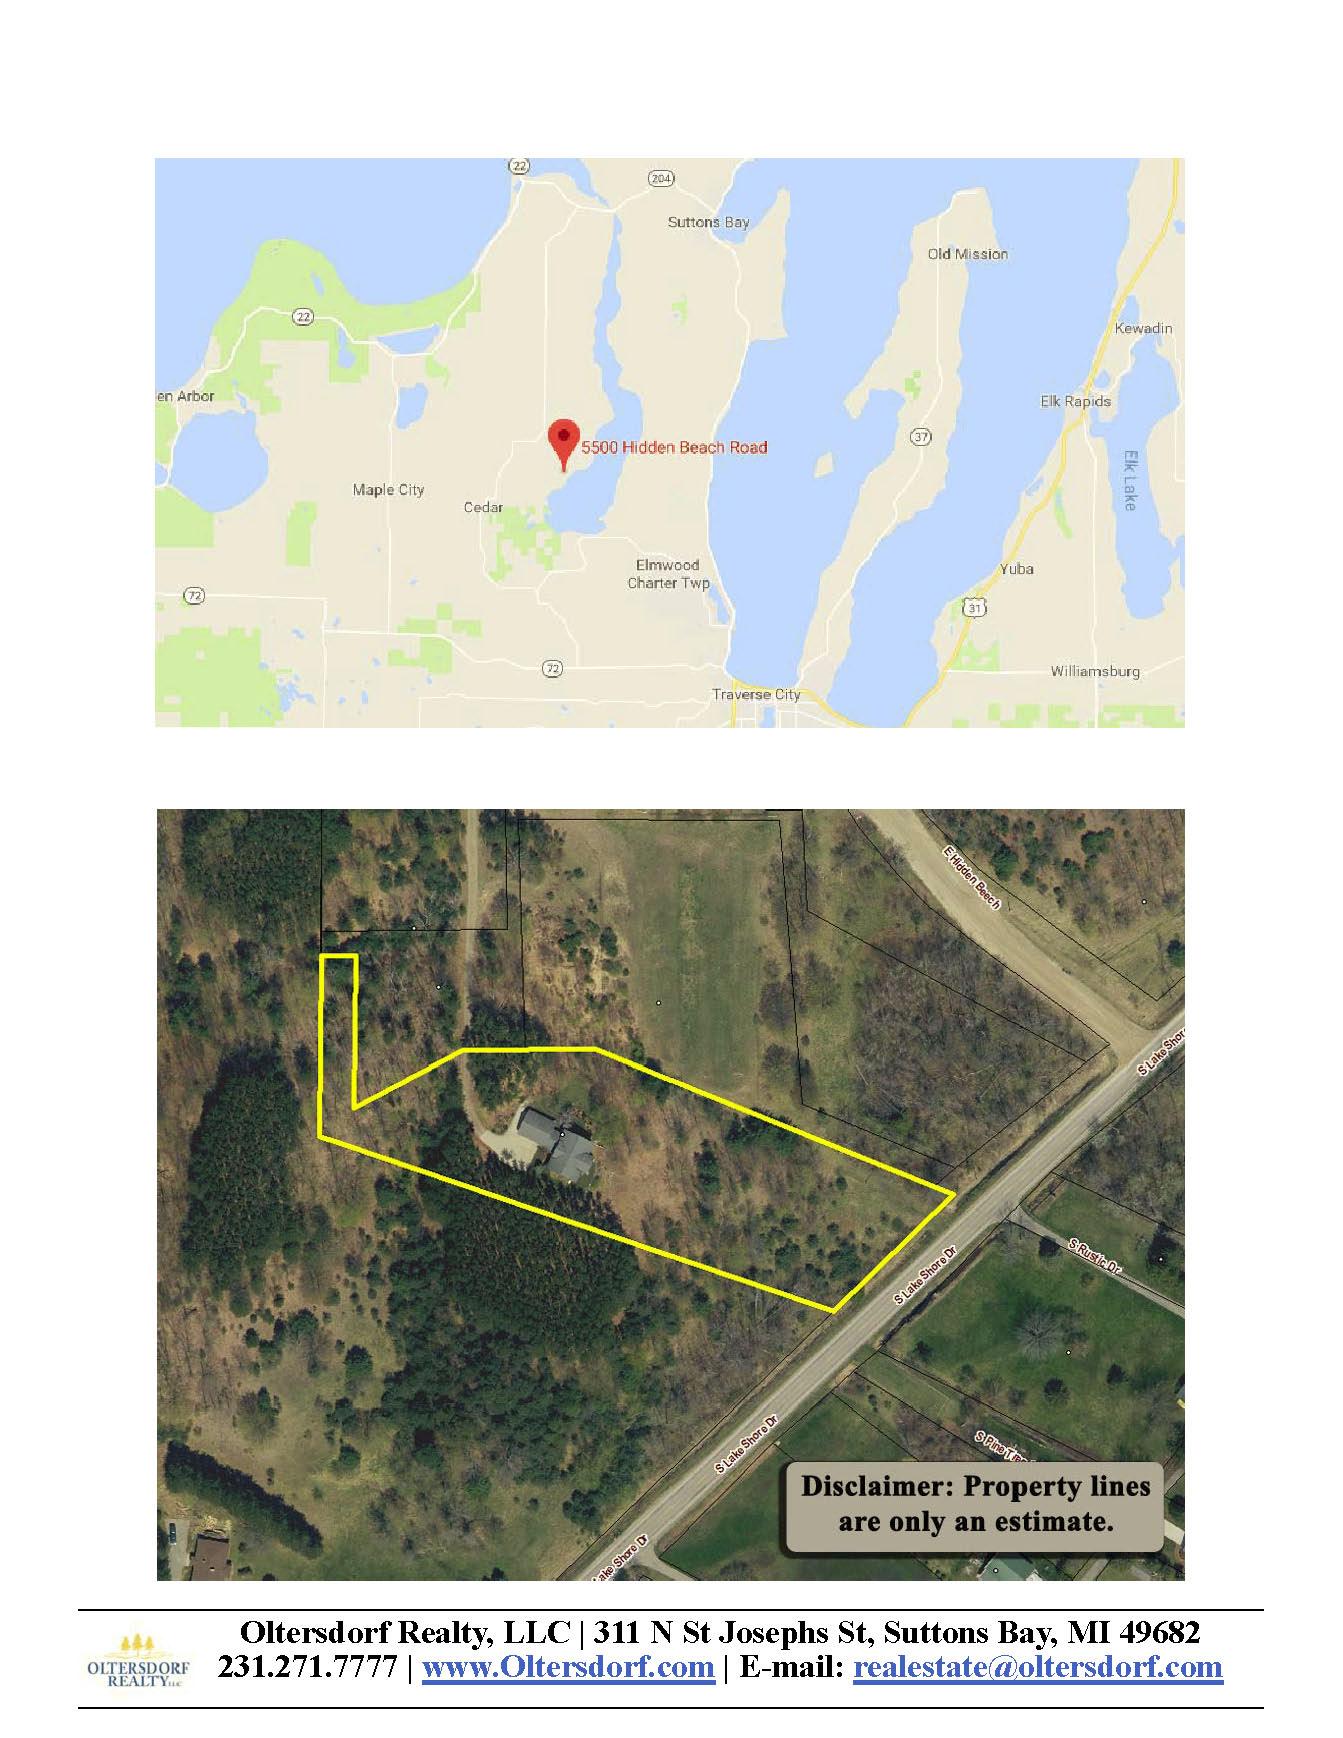 5500 E Hidden Beech, Cedar, MI - For sale by Oltersdorf Realty LLC - Marketing Packet (11).jpg